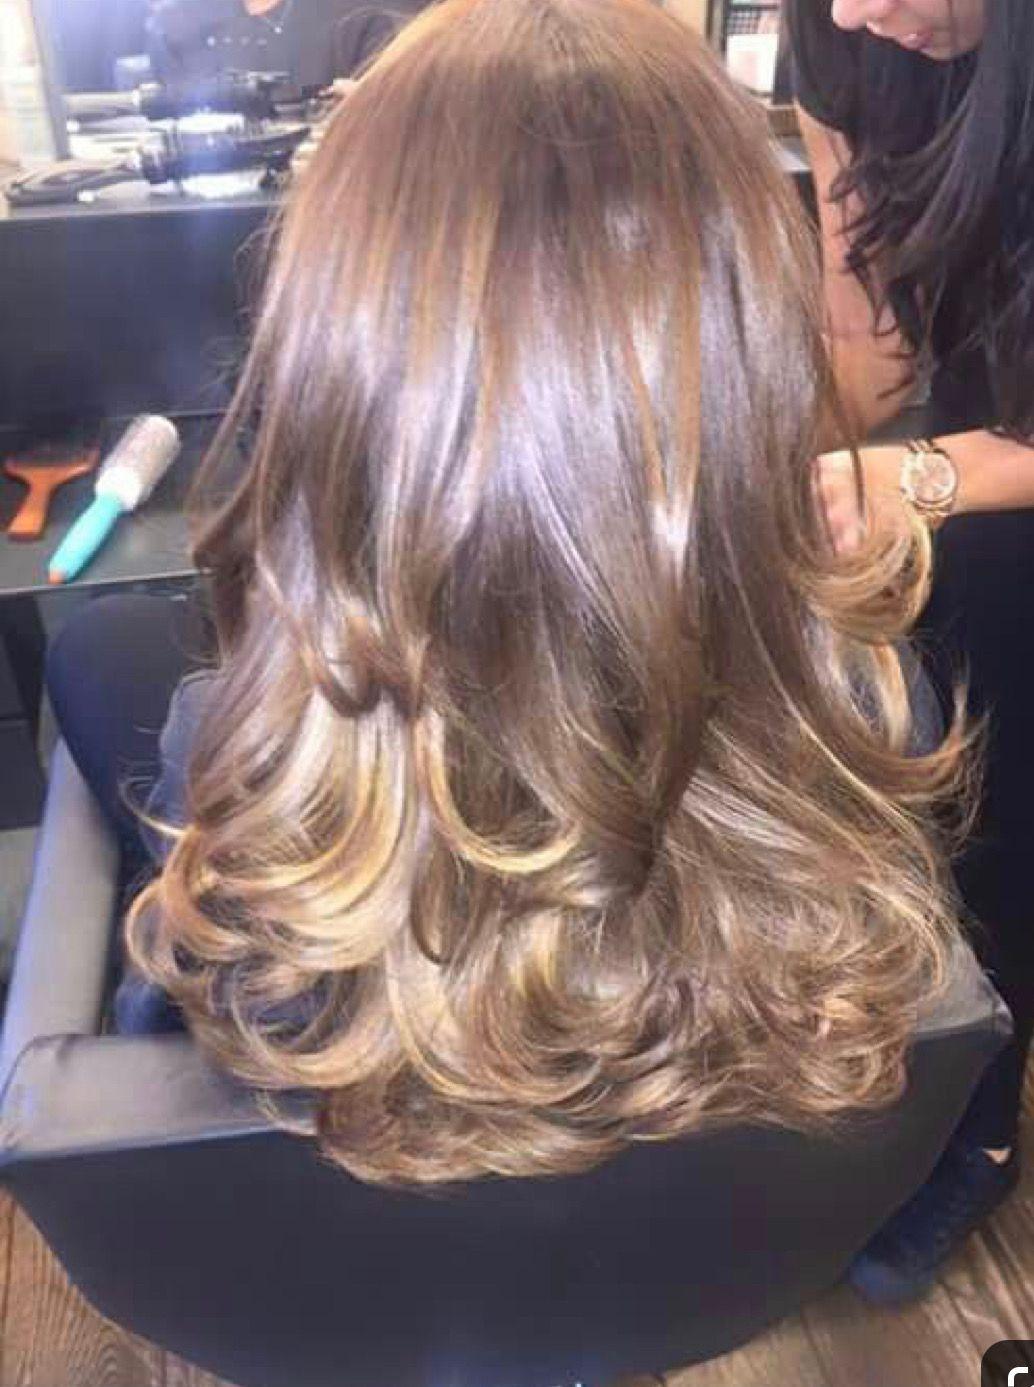 Pin By Mary Ellen Baker On The Pretty In 2020 Blowout Hair Blow Dry Hair Blow Dry Hair Curls